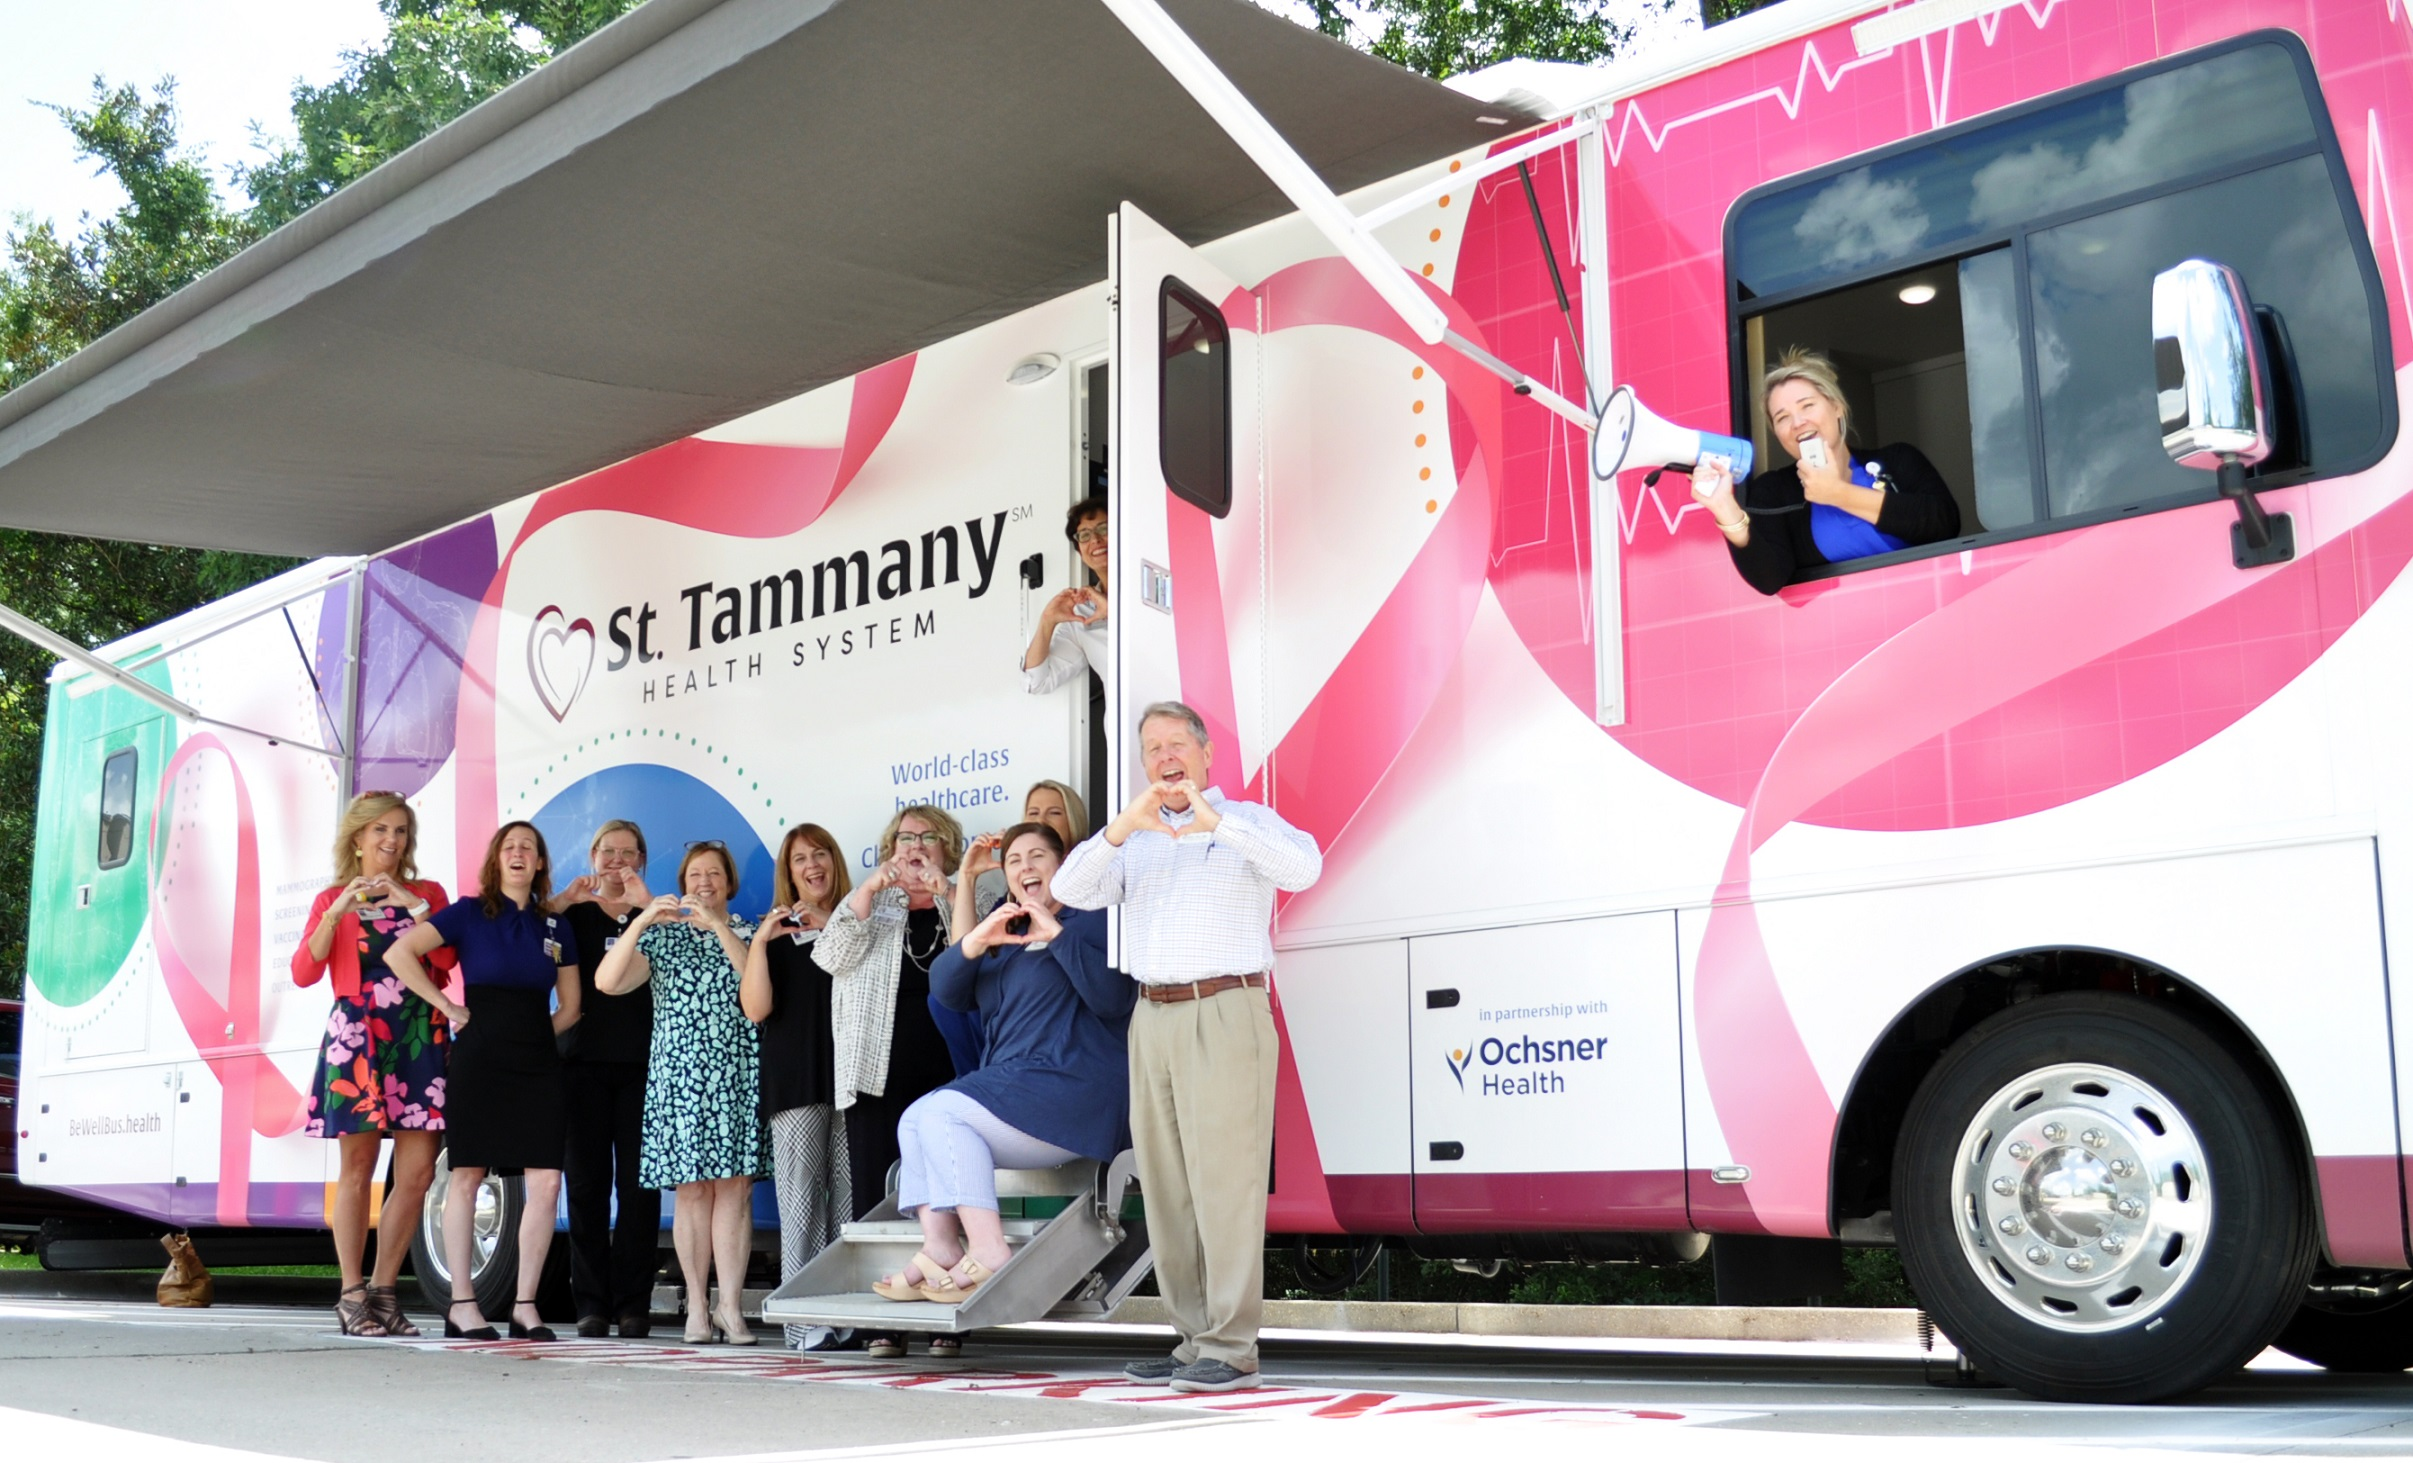 St. Tammany Health System staff photo